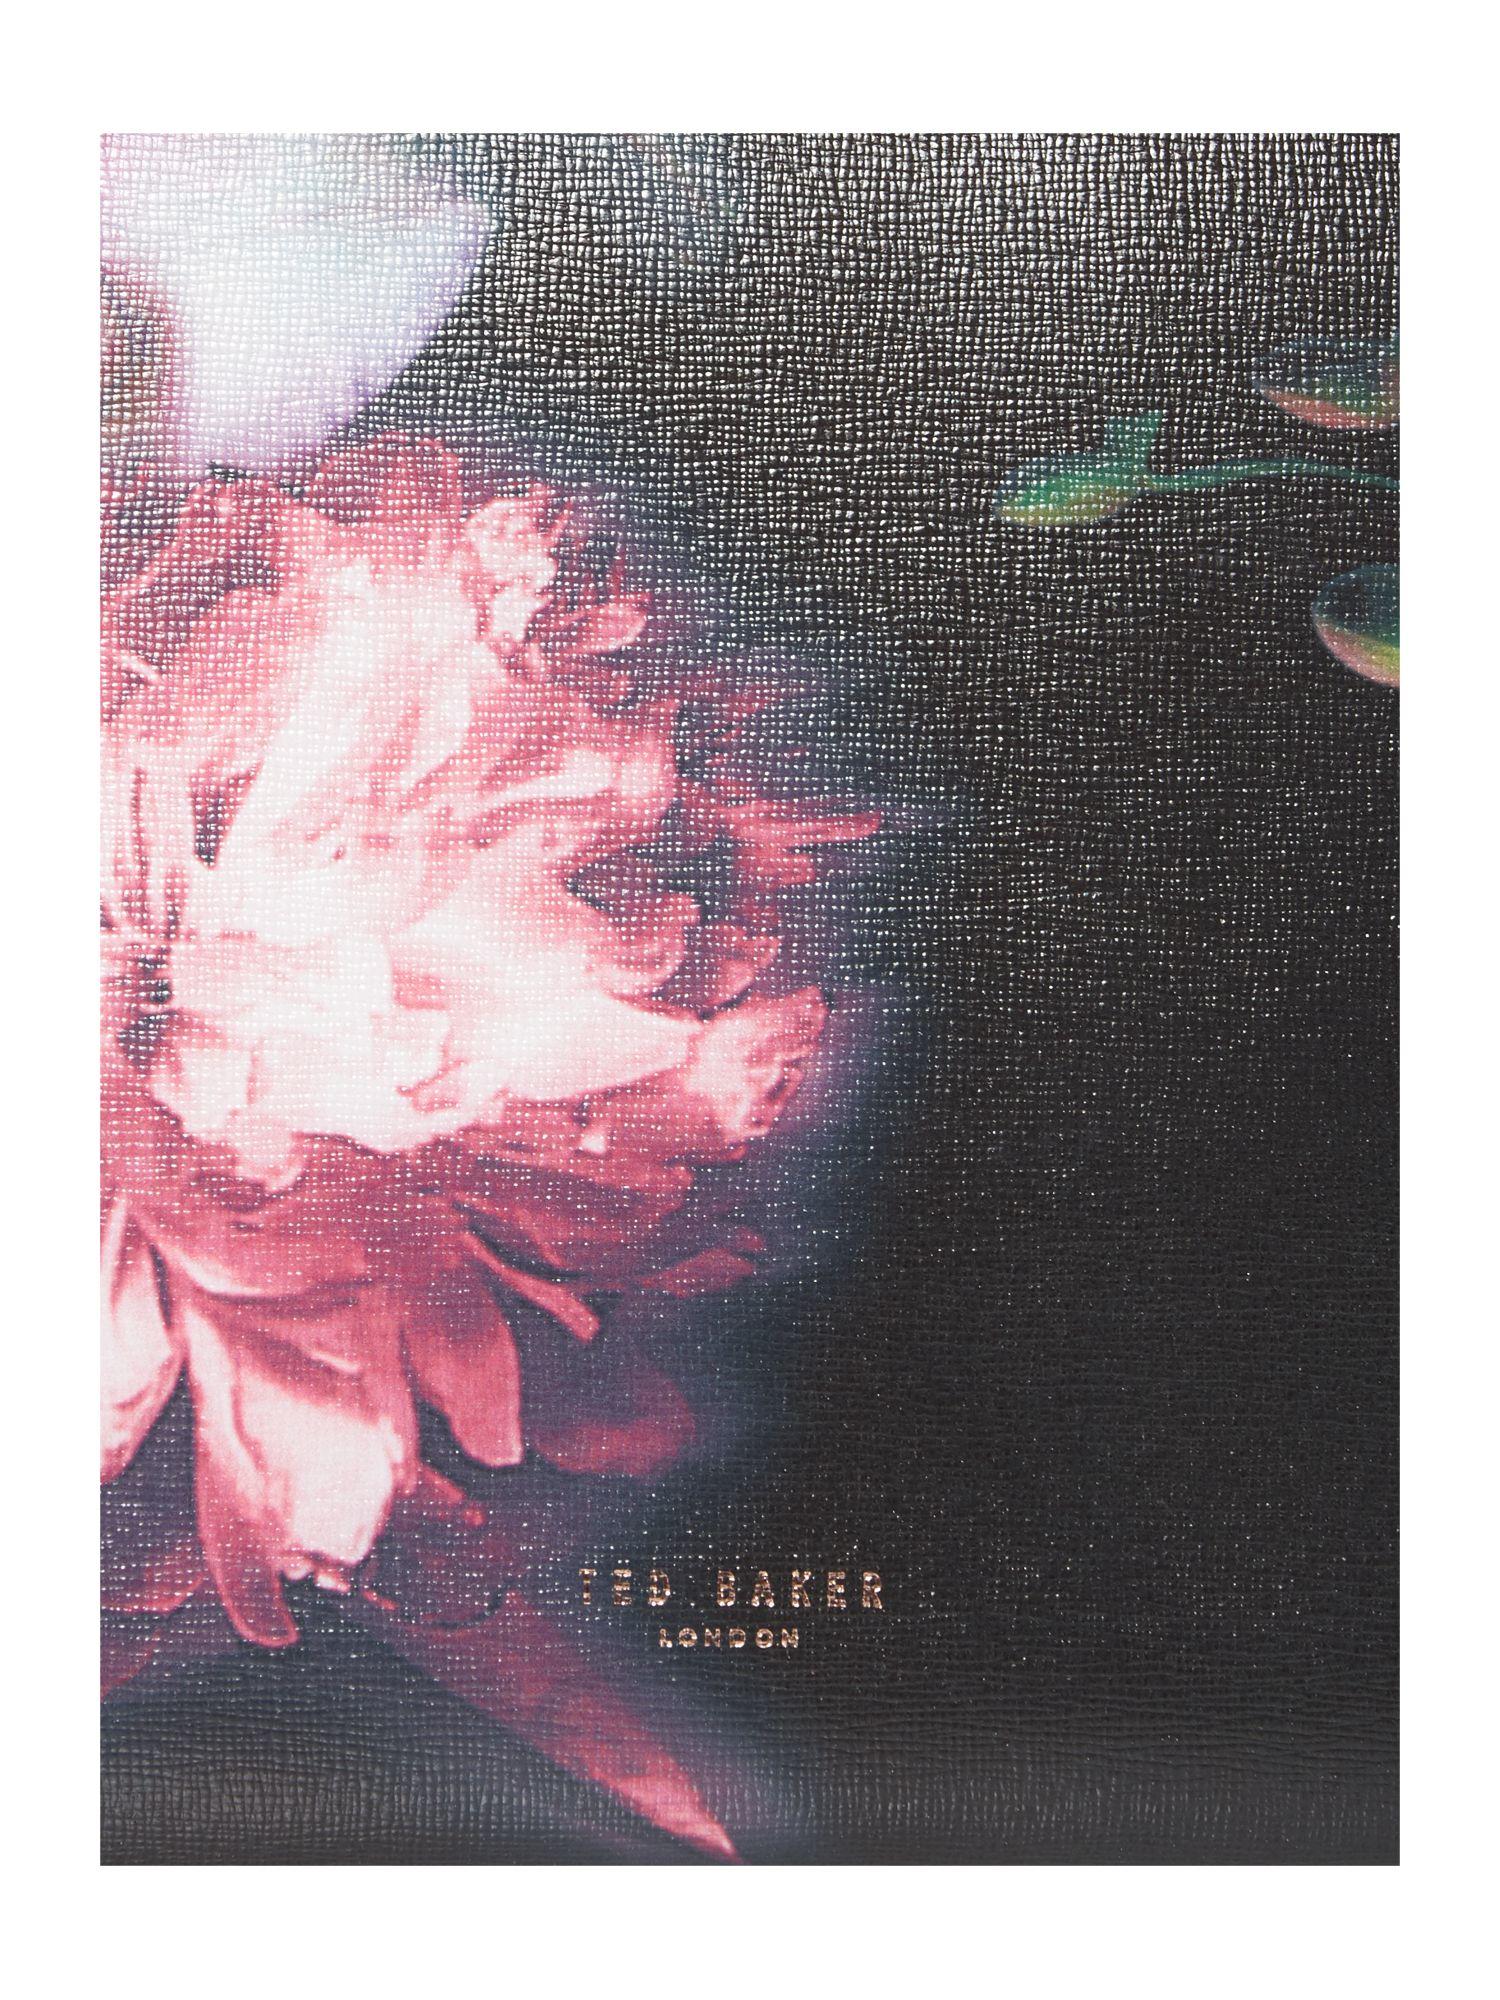 Ted Baker Lietta Black Floral Large Tote Bag in Pink